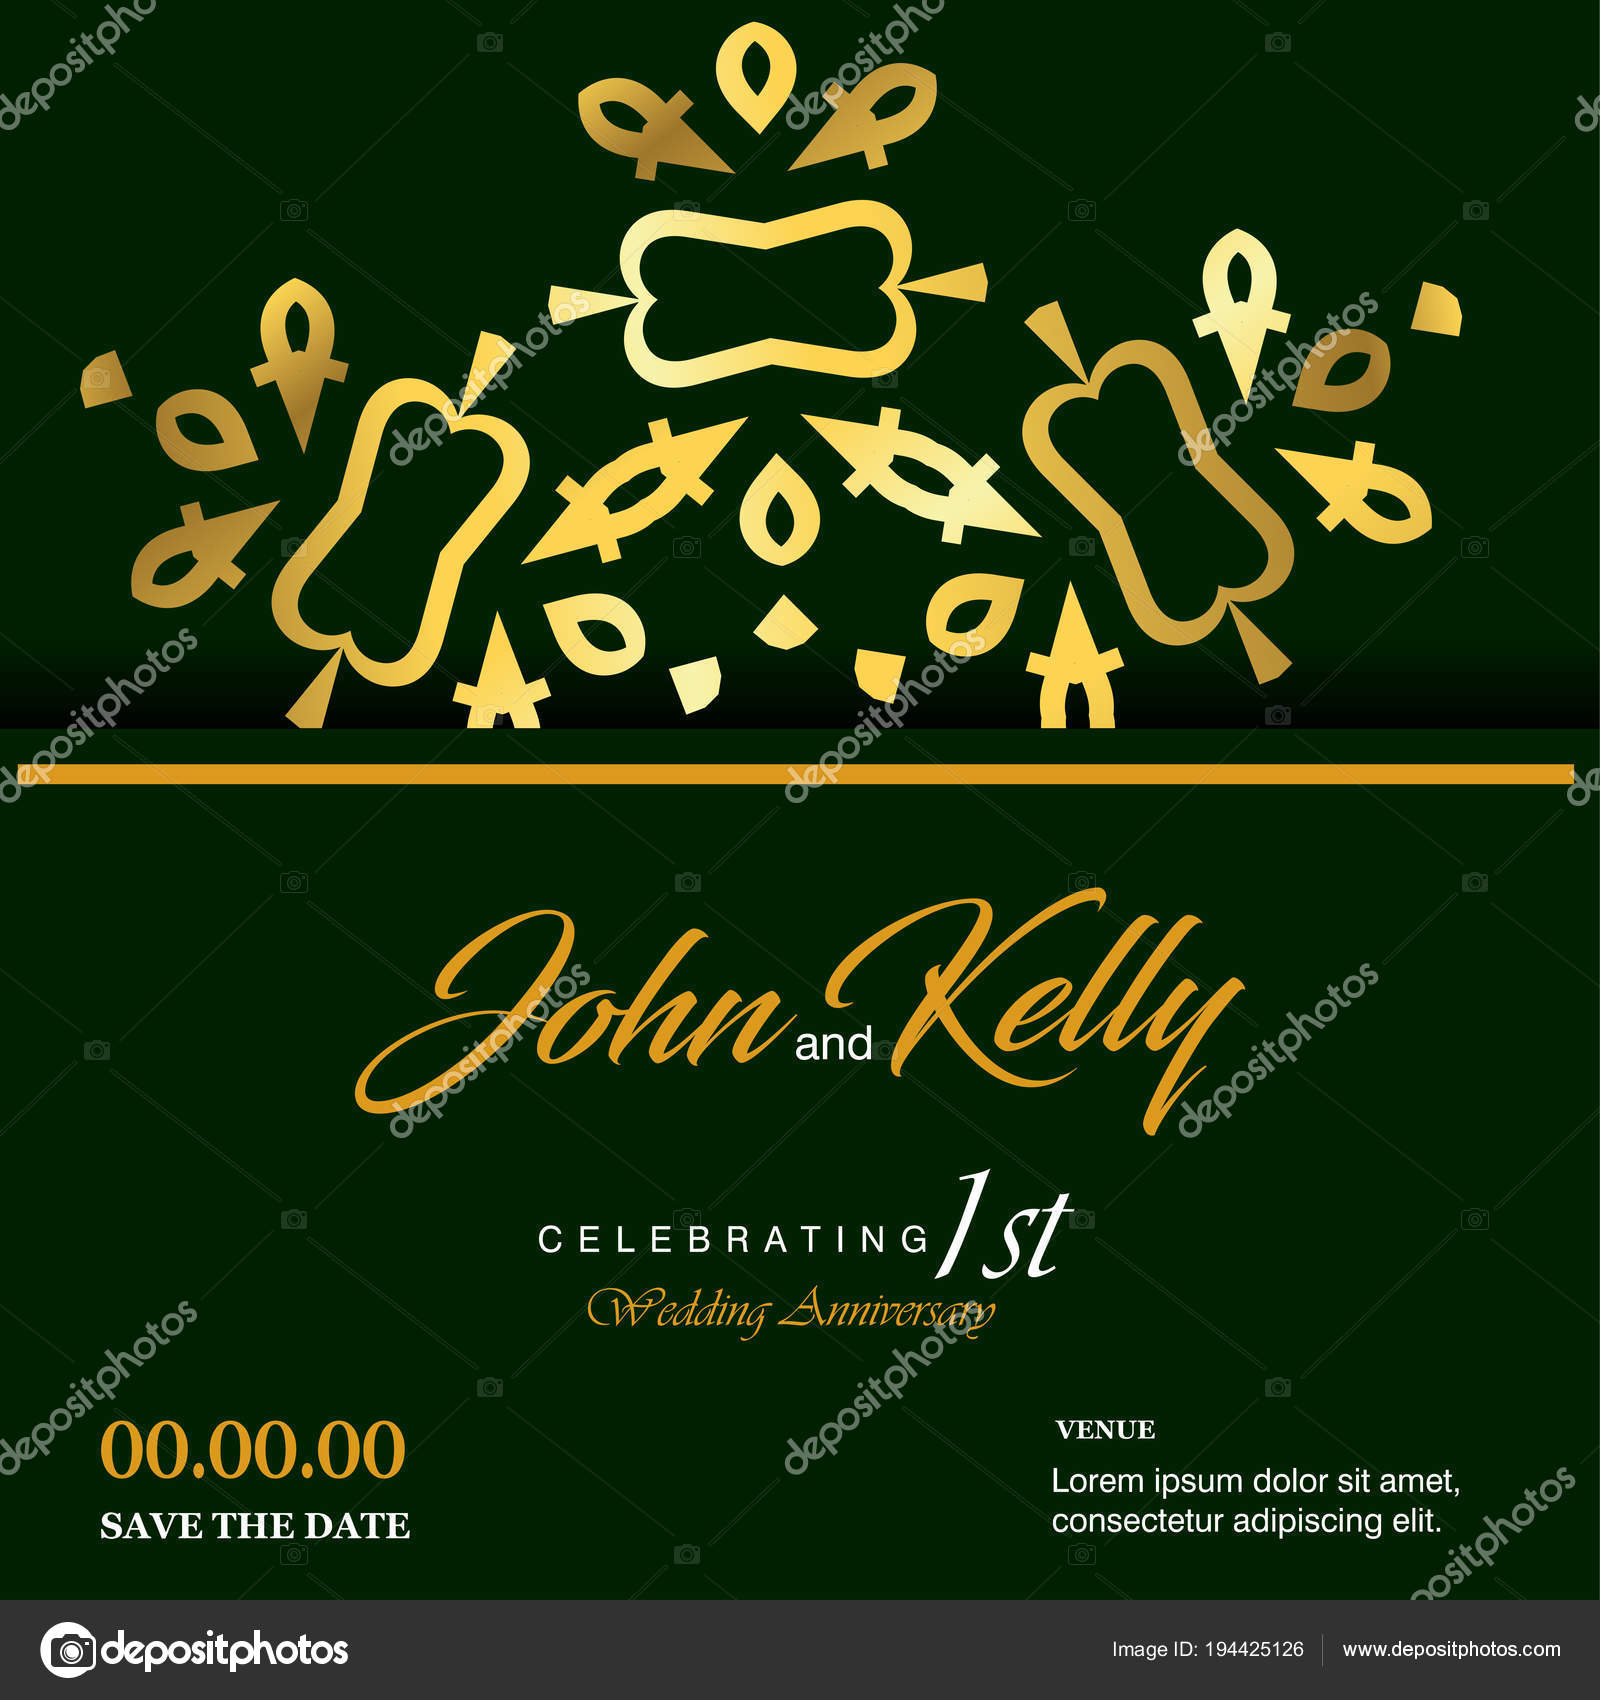 Wedding Cards Designs In Pakistan 2018 Wedding Card Design